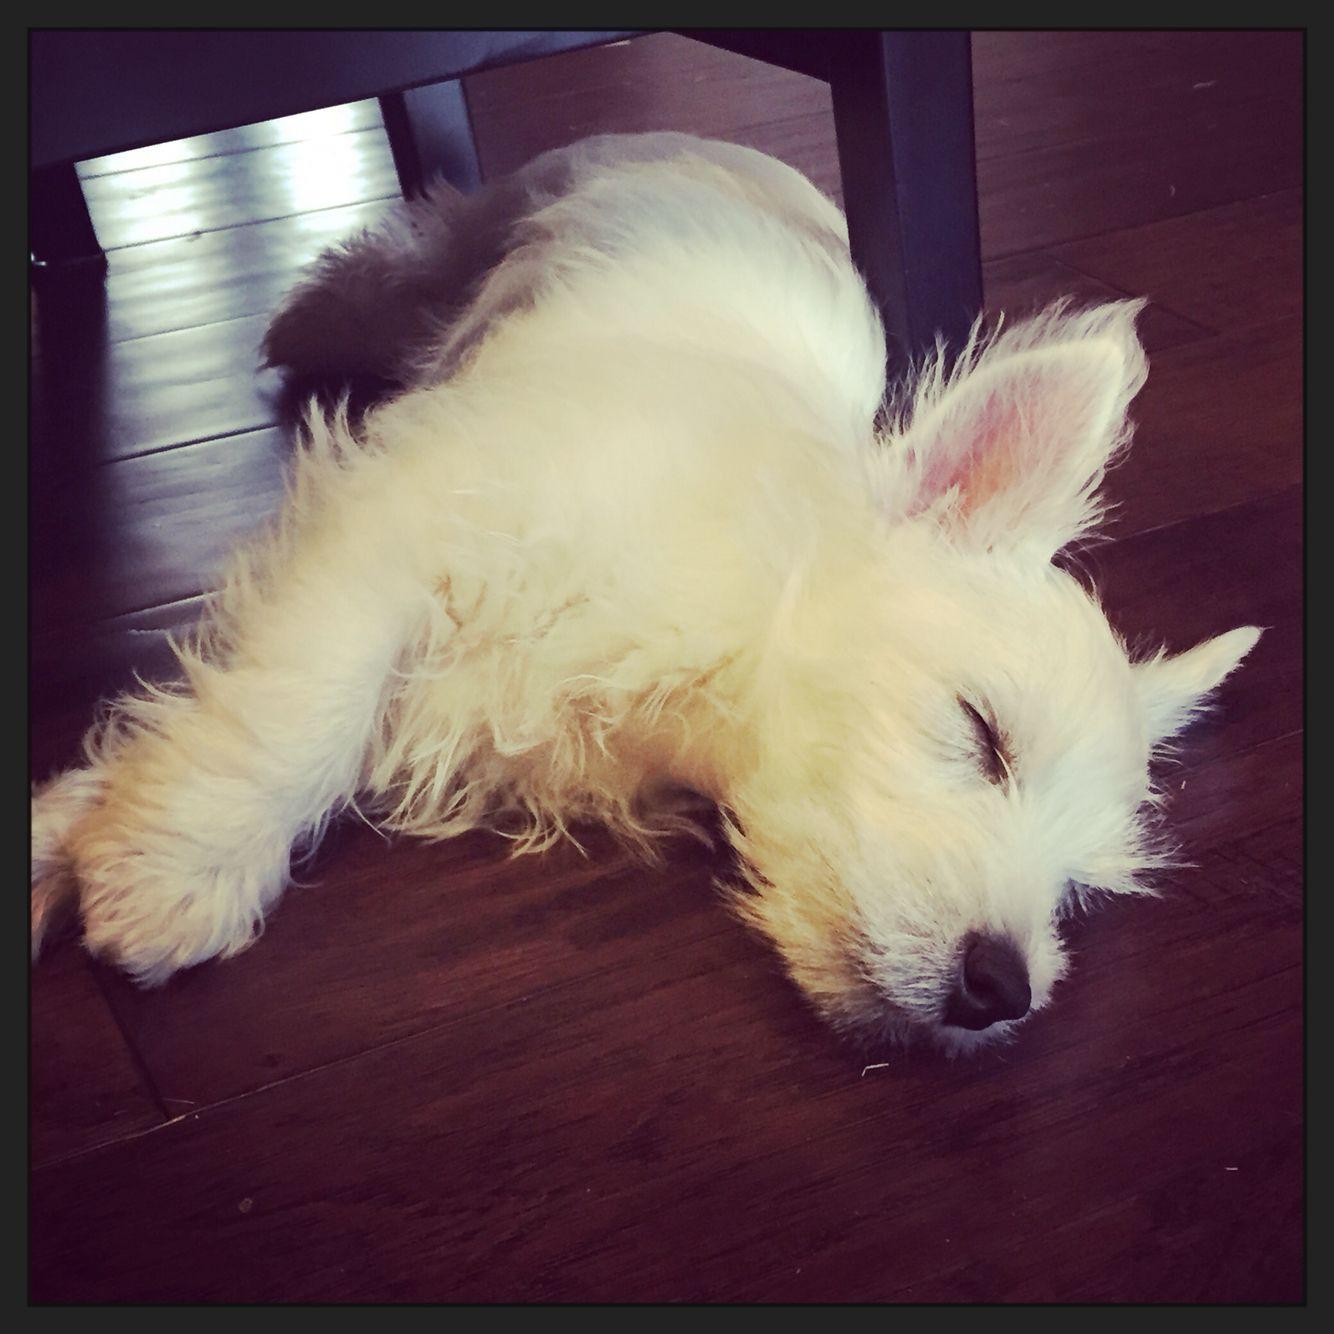 Sweet puppy dreams, little Max.